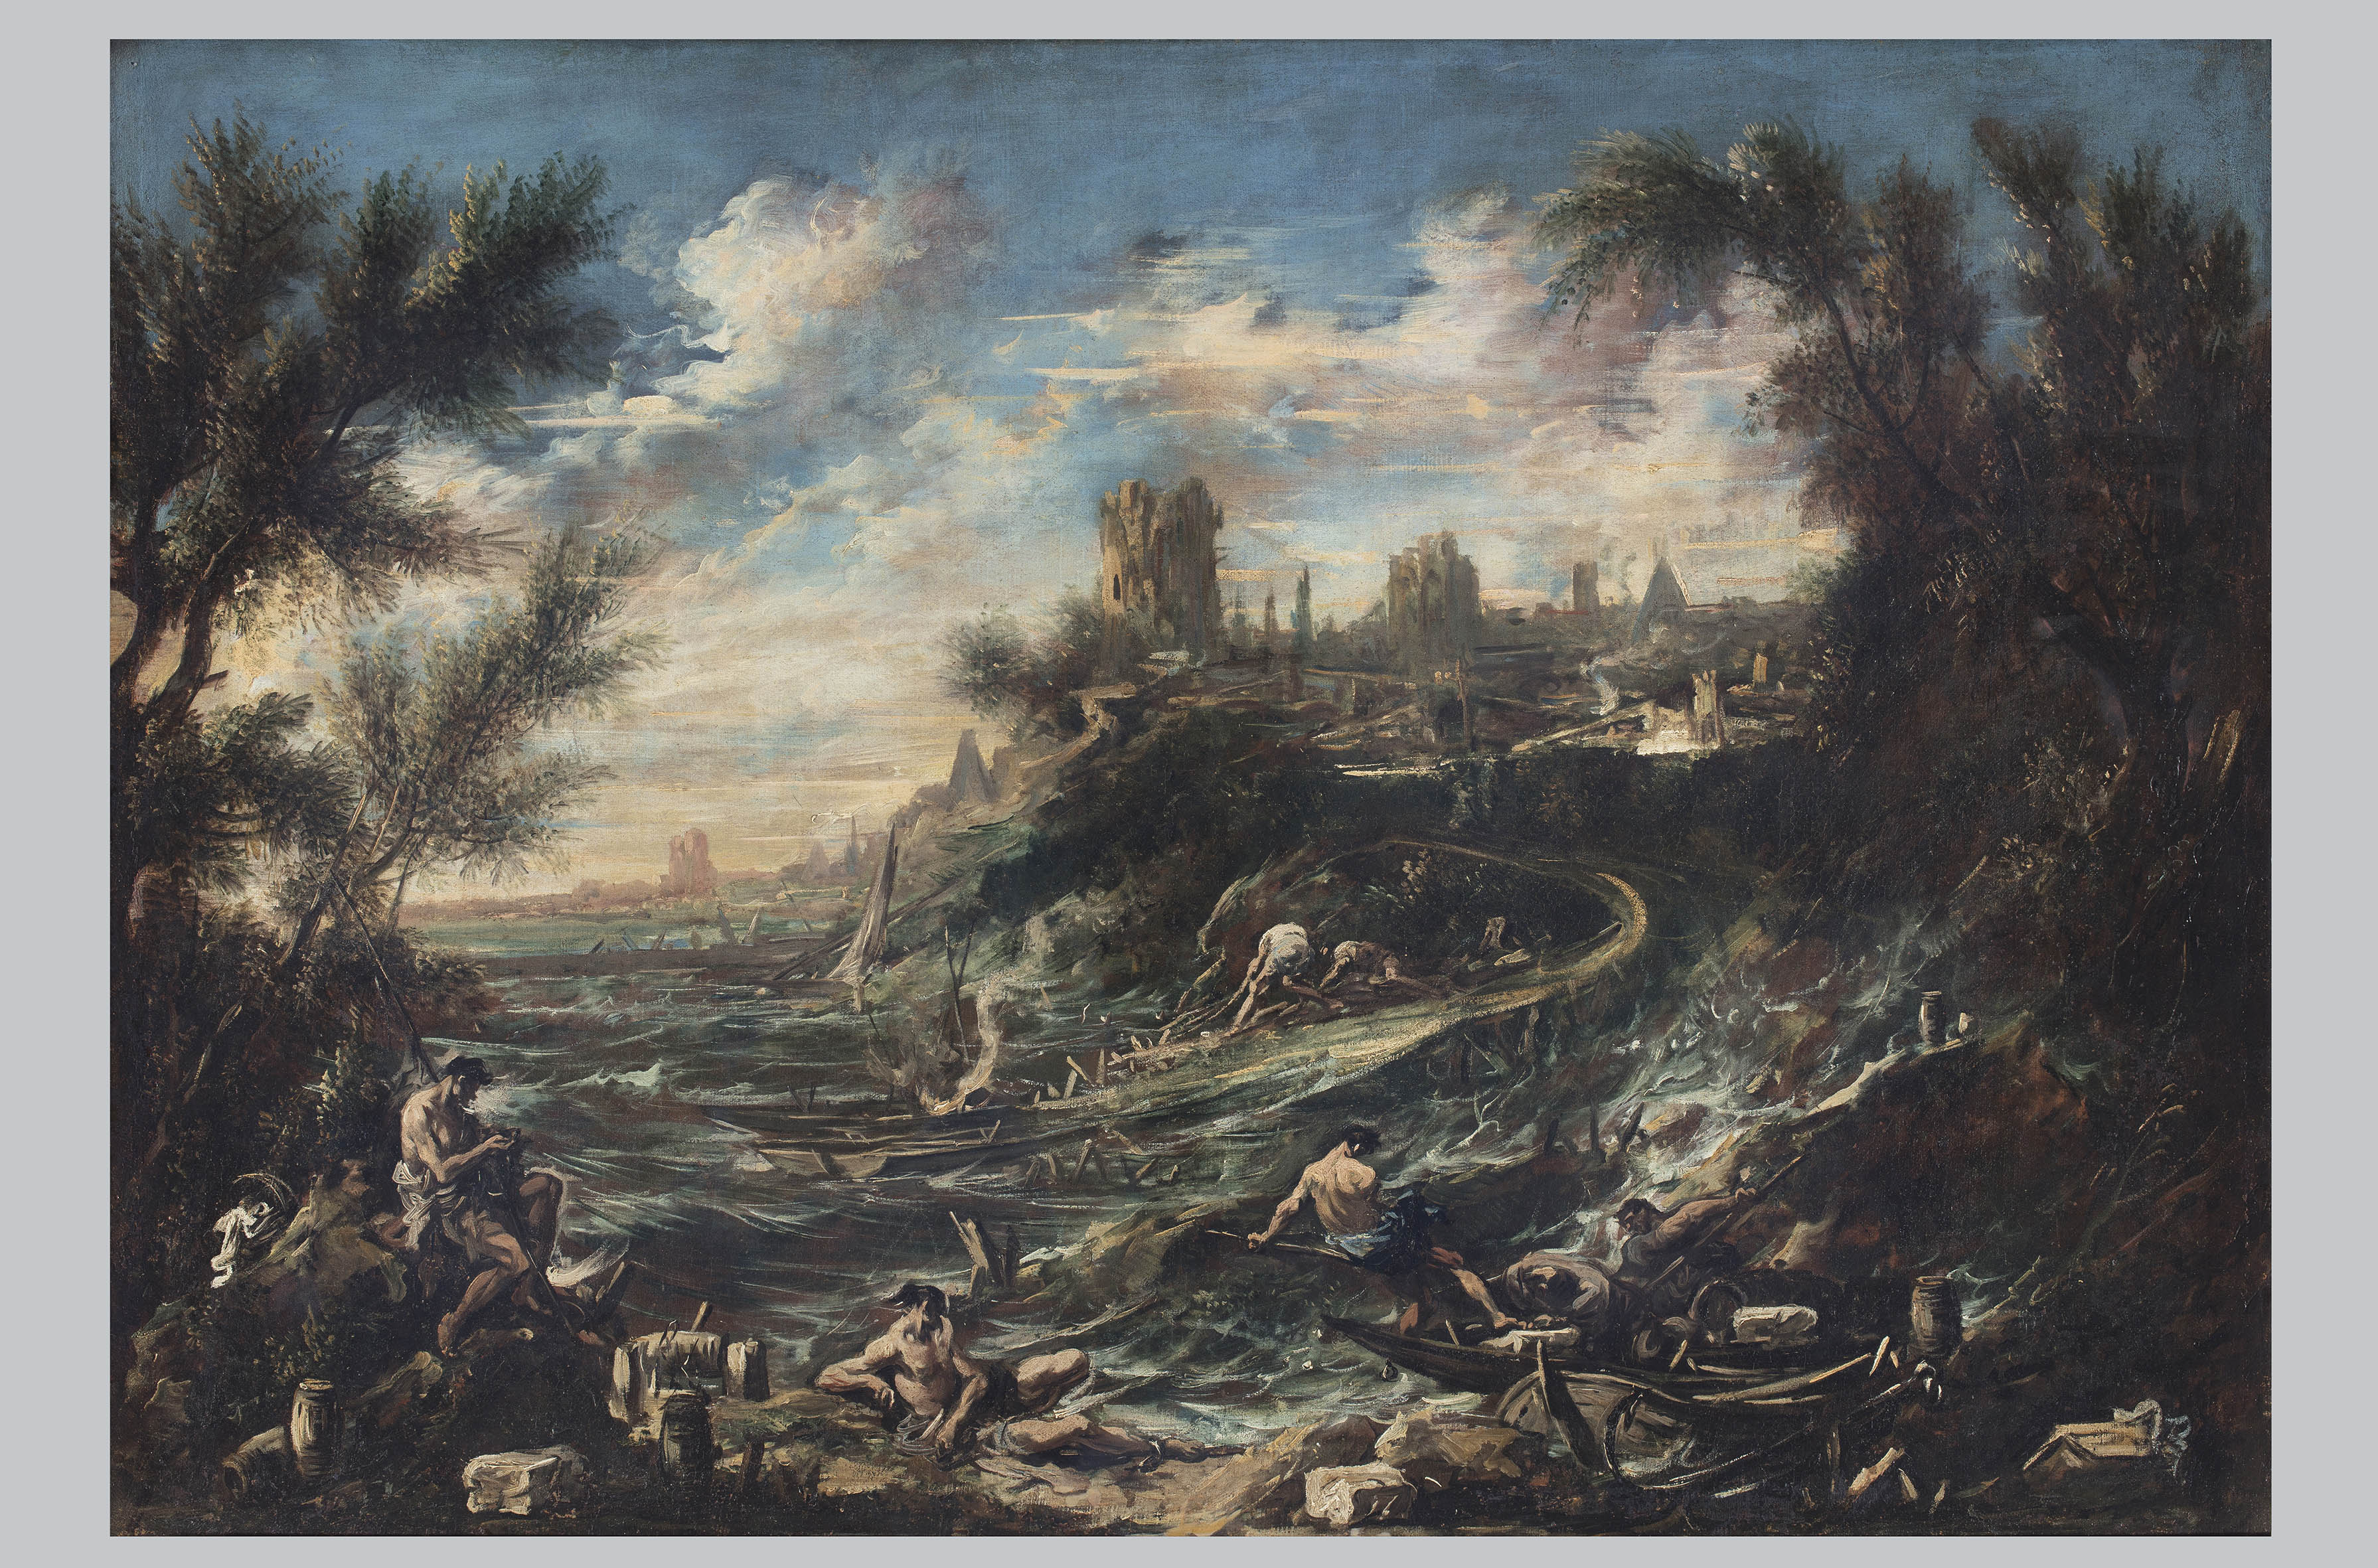 Alessandro Magnasco, Baia marina con pescatori, olio su tela, cm 91x130